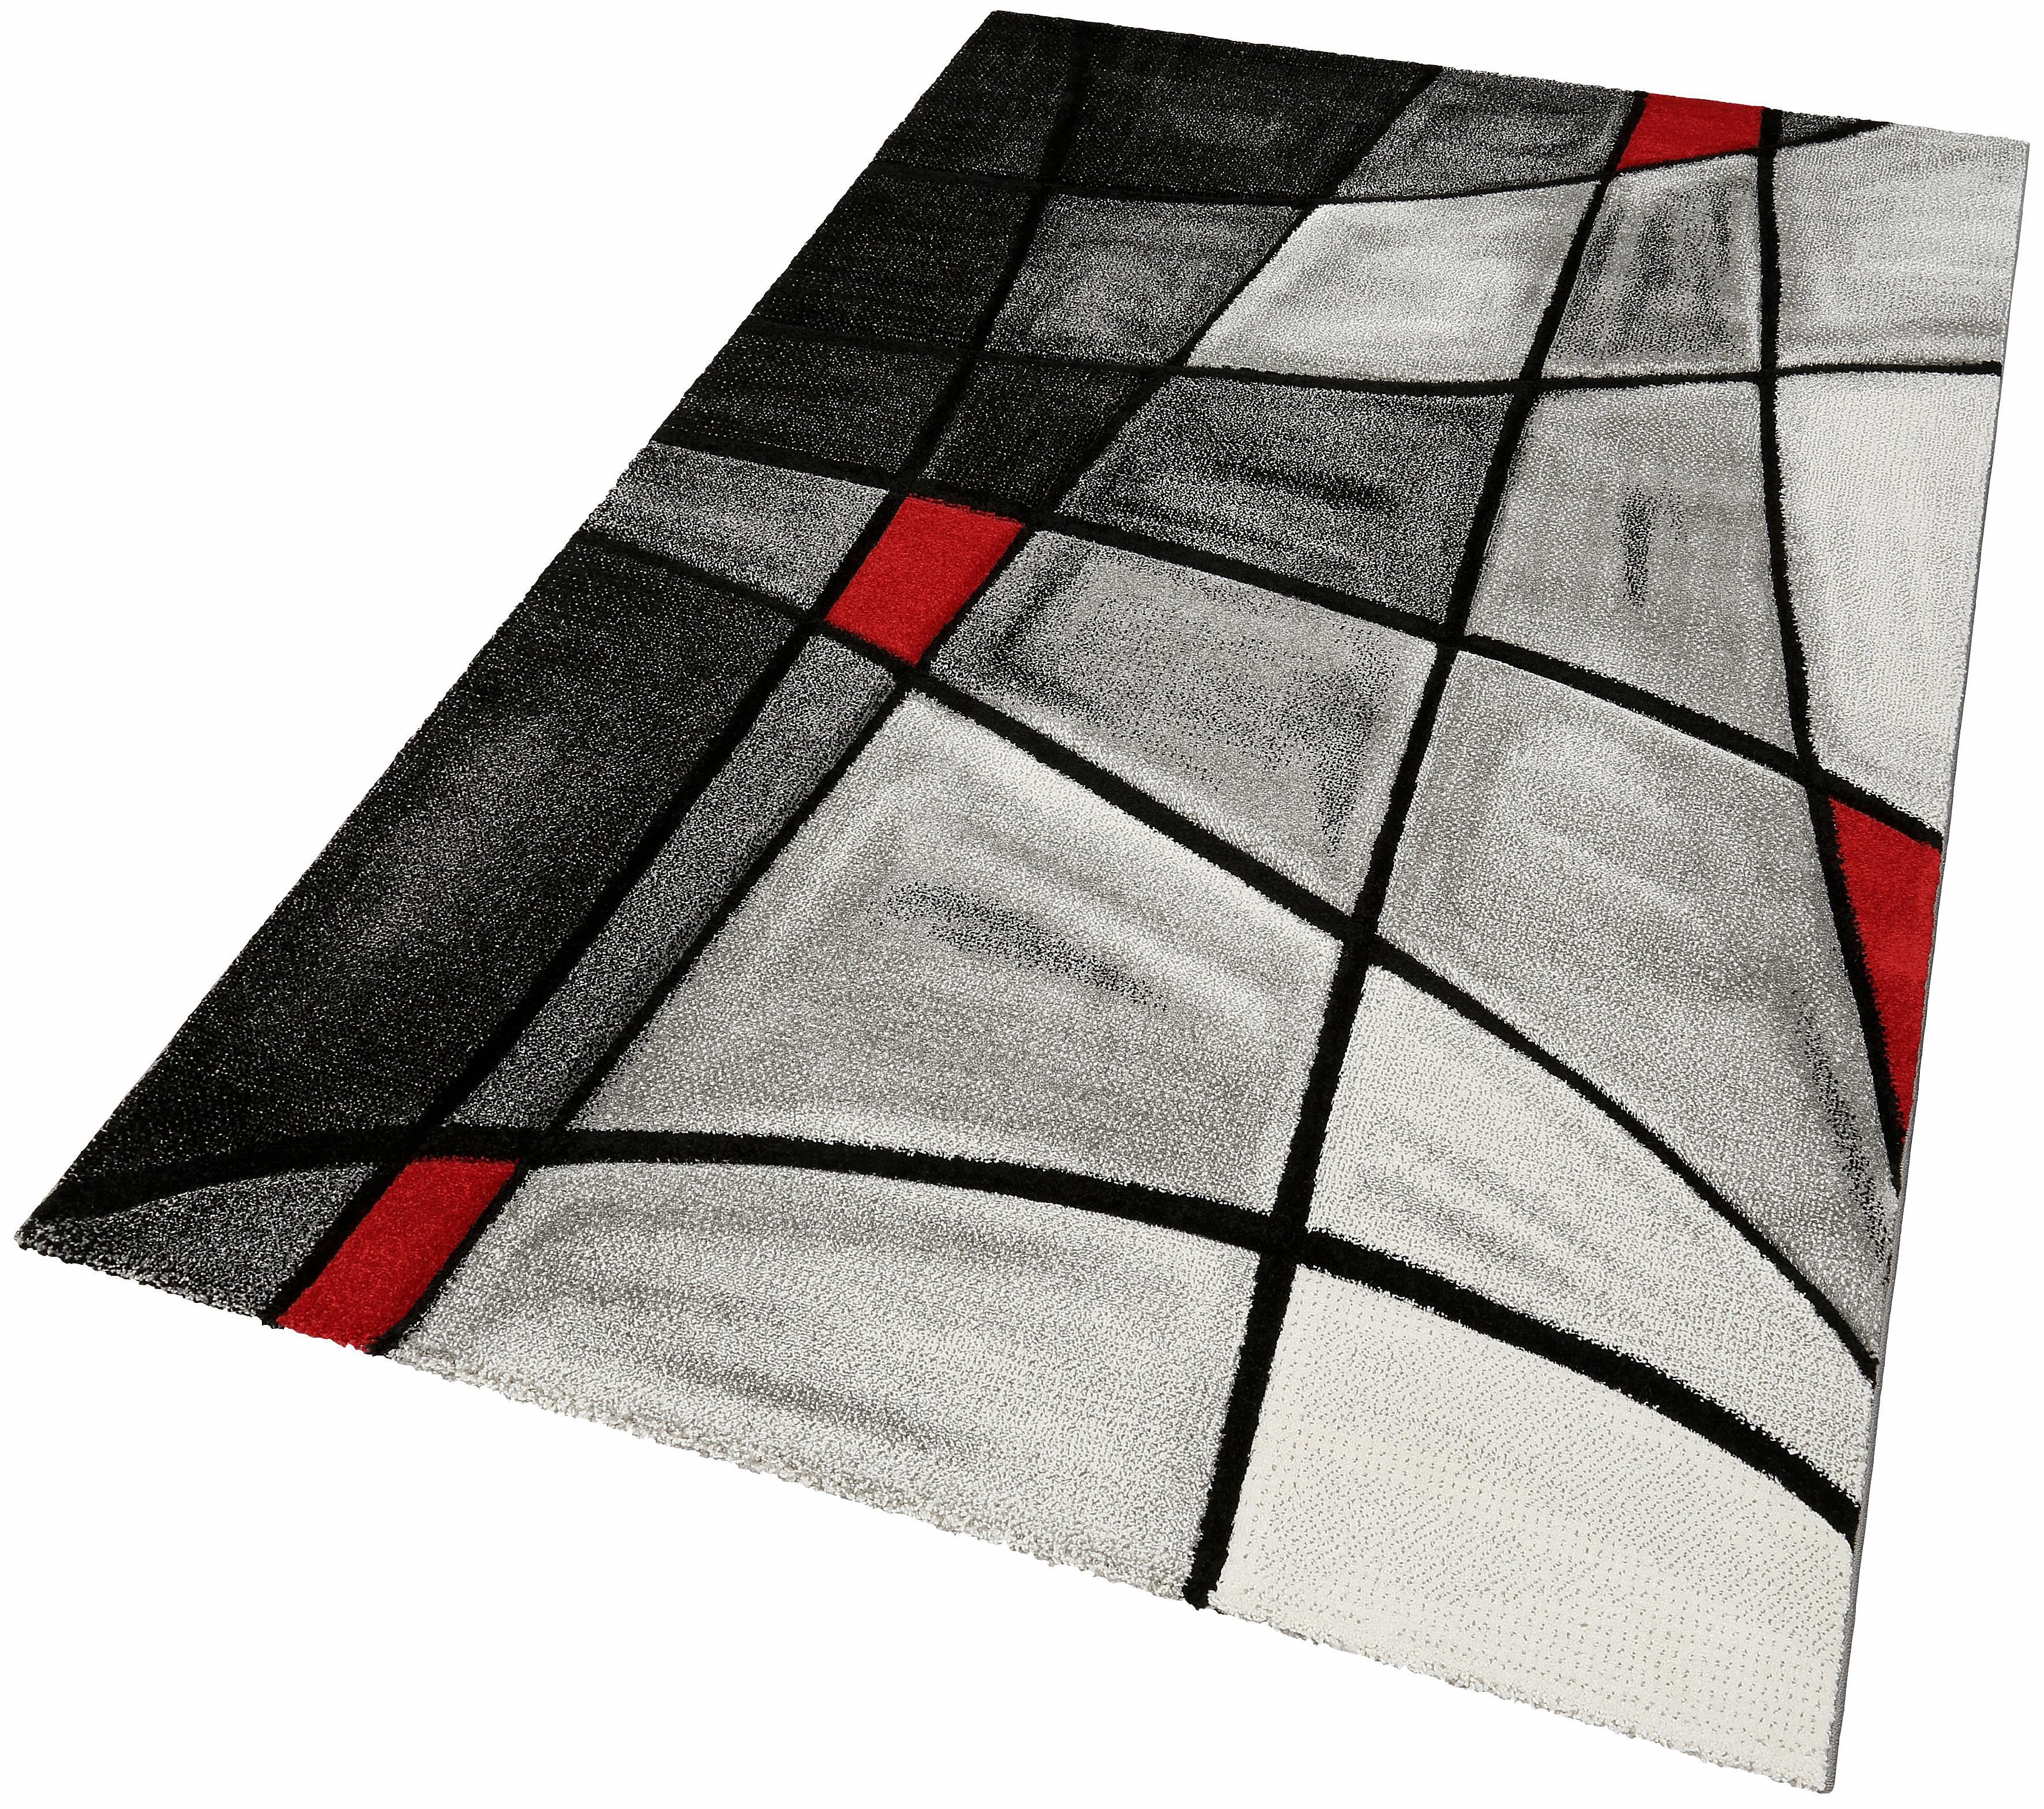 teppich doubs merinos rechteckig h he 13 mm. Black Bedroom Furniture Sets. Home Design Ideas